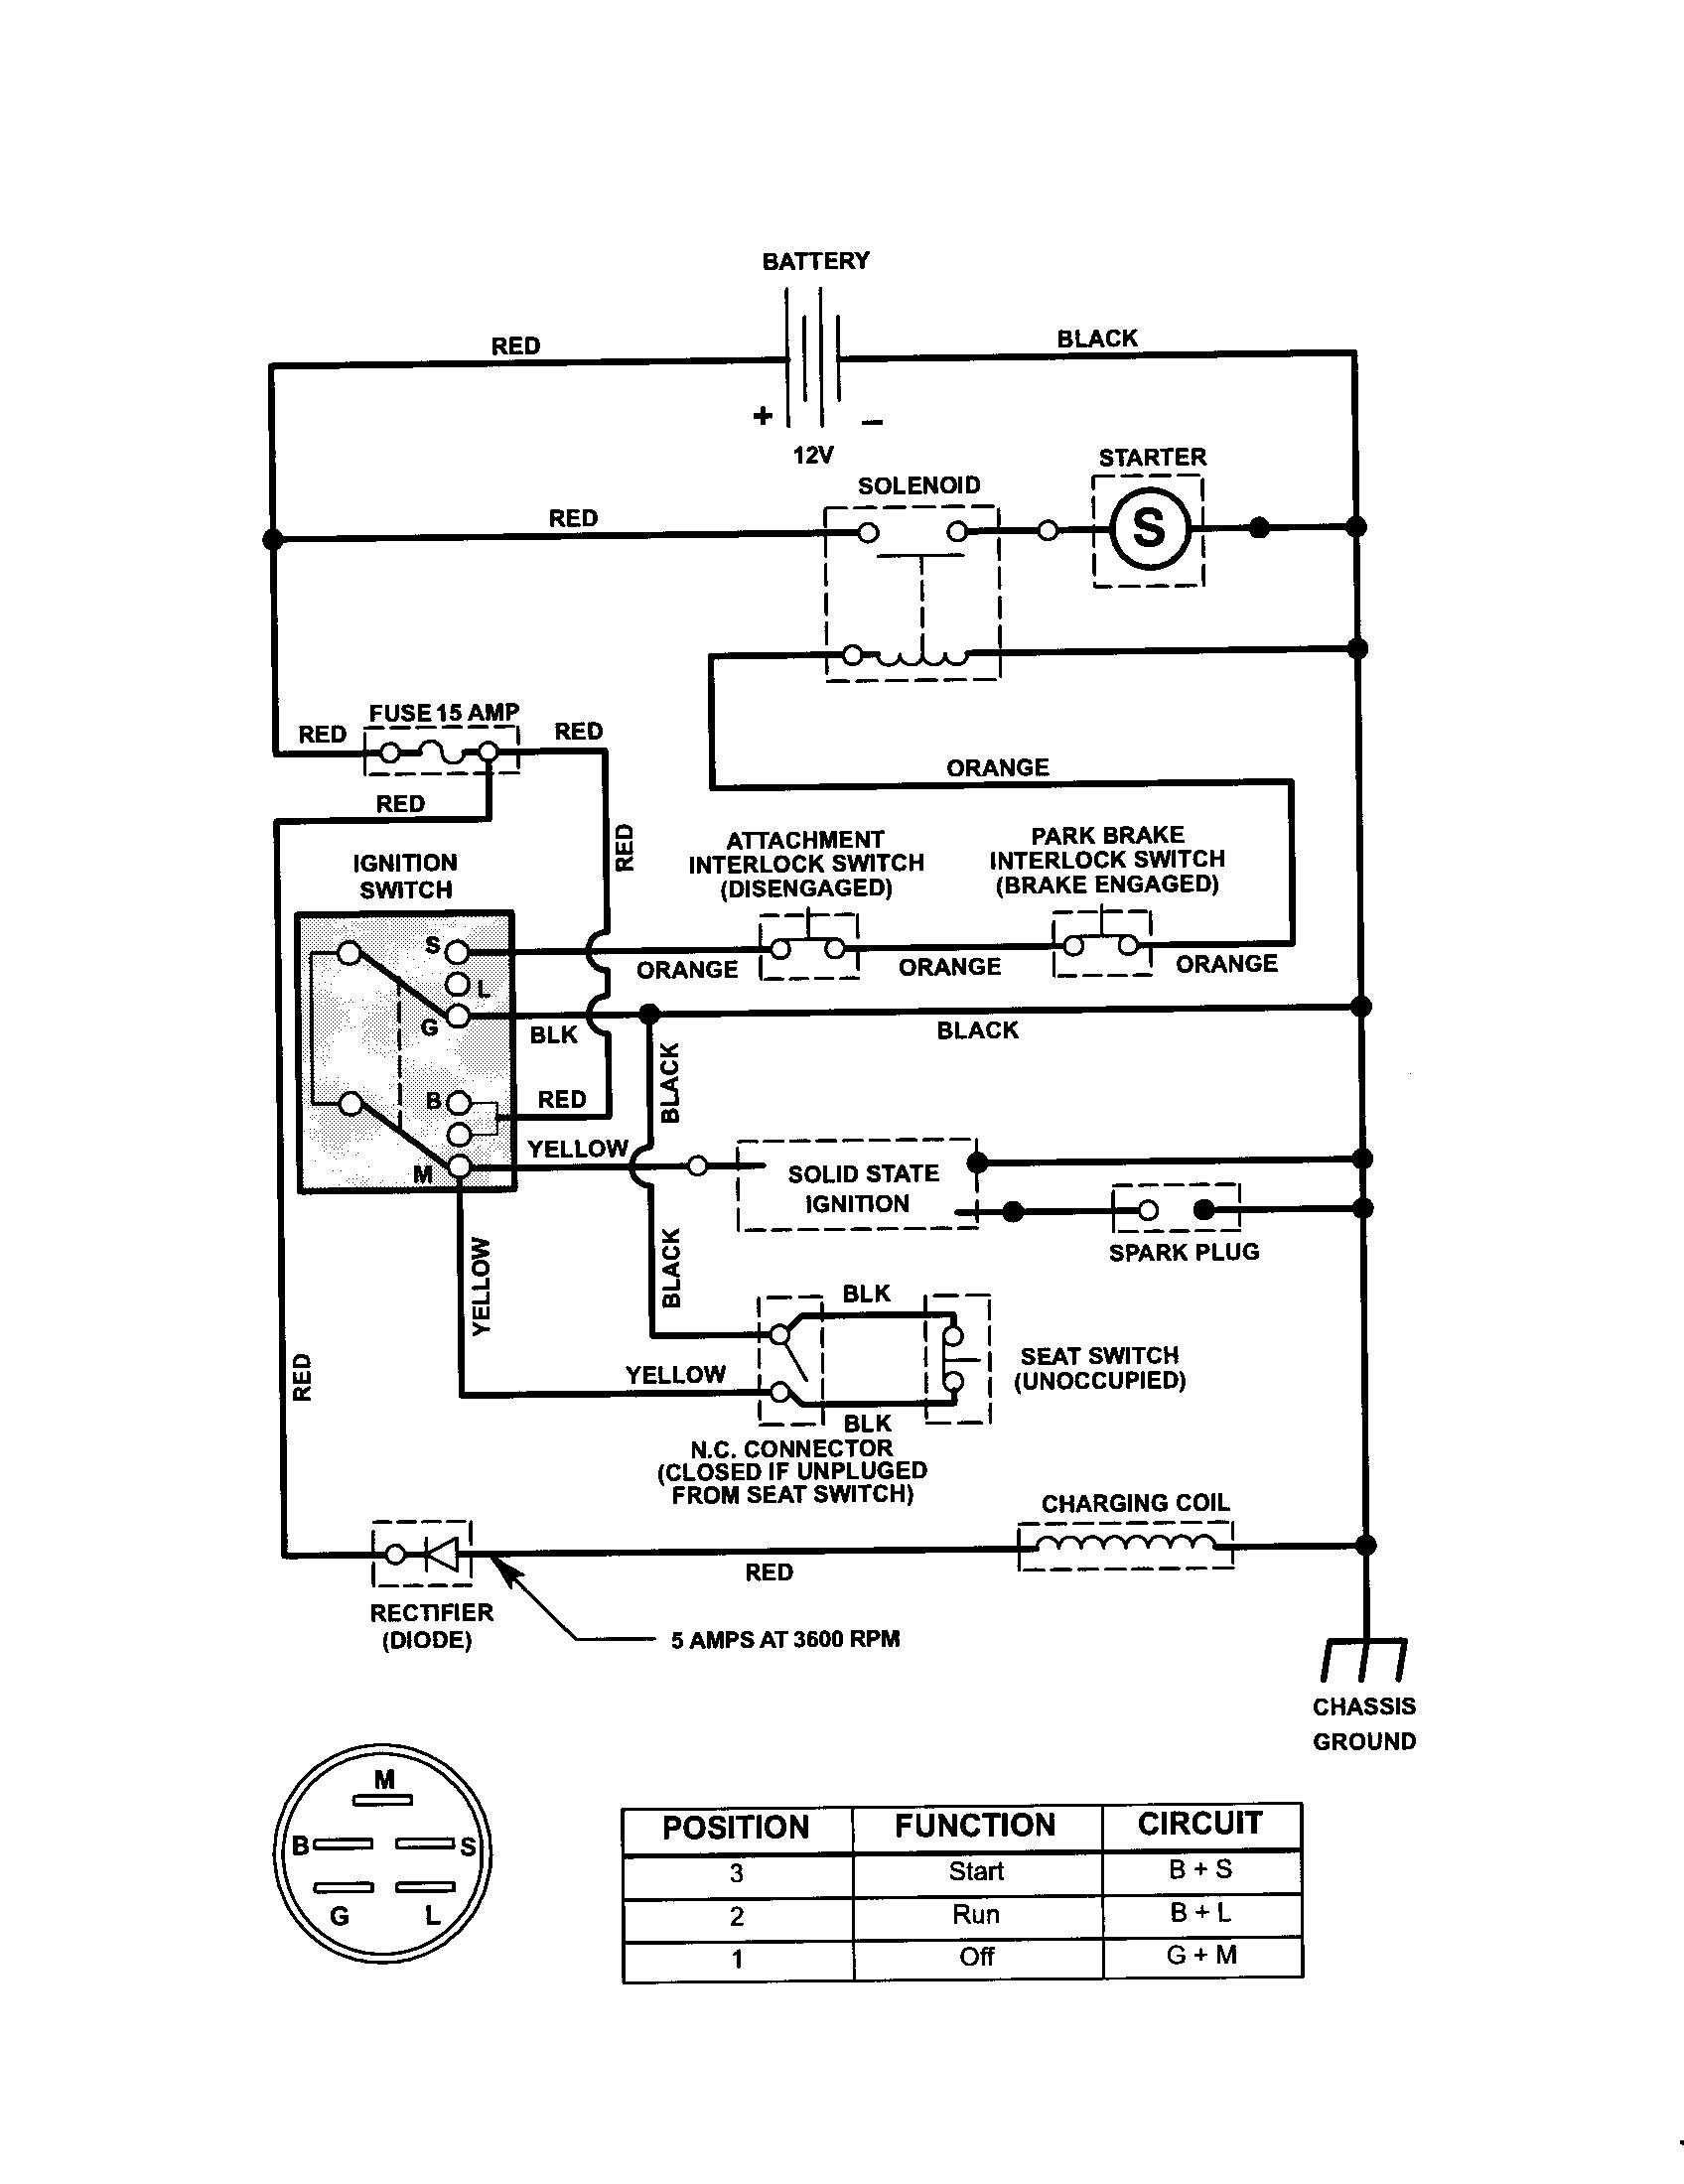 [DIAGRAM_3NM]  F254E5 Troy Bilt Bronco Electrical Wiring Diagrams | Wiring Library | Troy Bilt Bronco Electrical Wiring Diagrams |  | Wiring Library